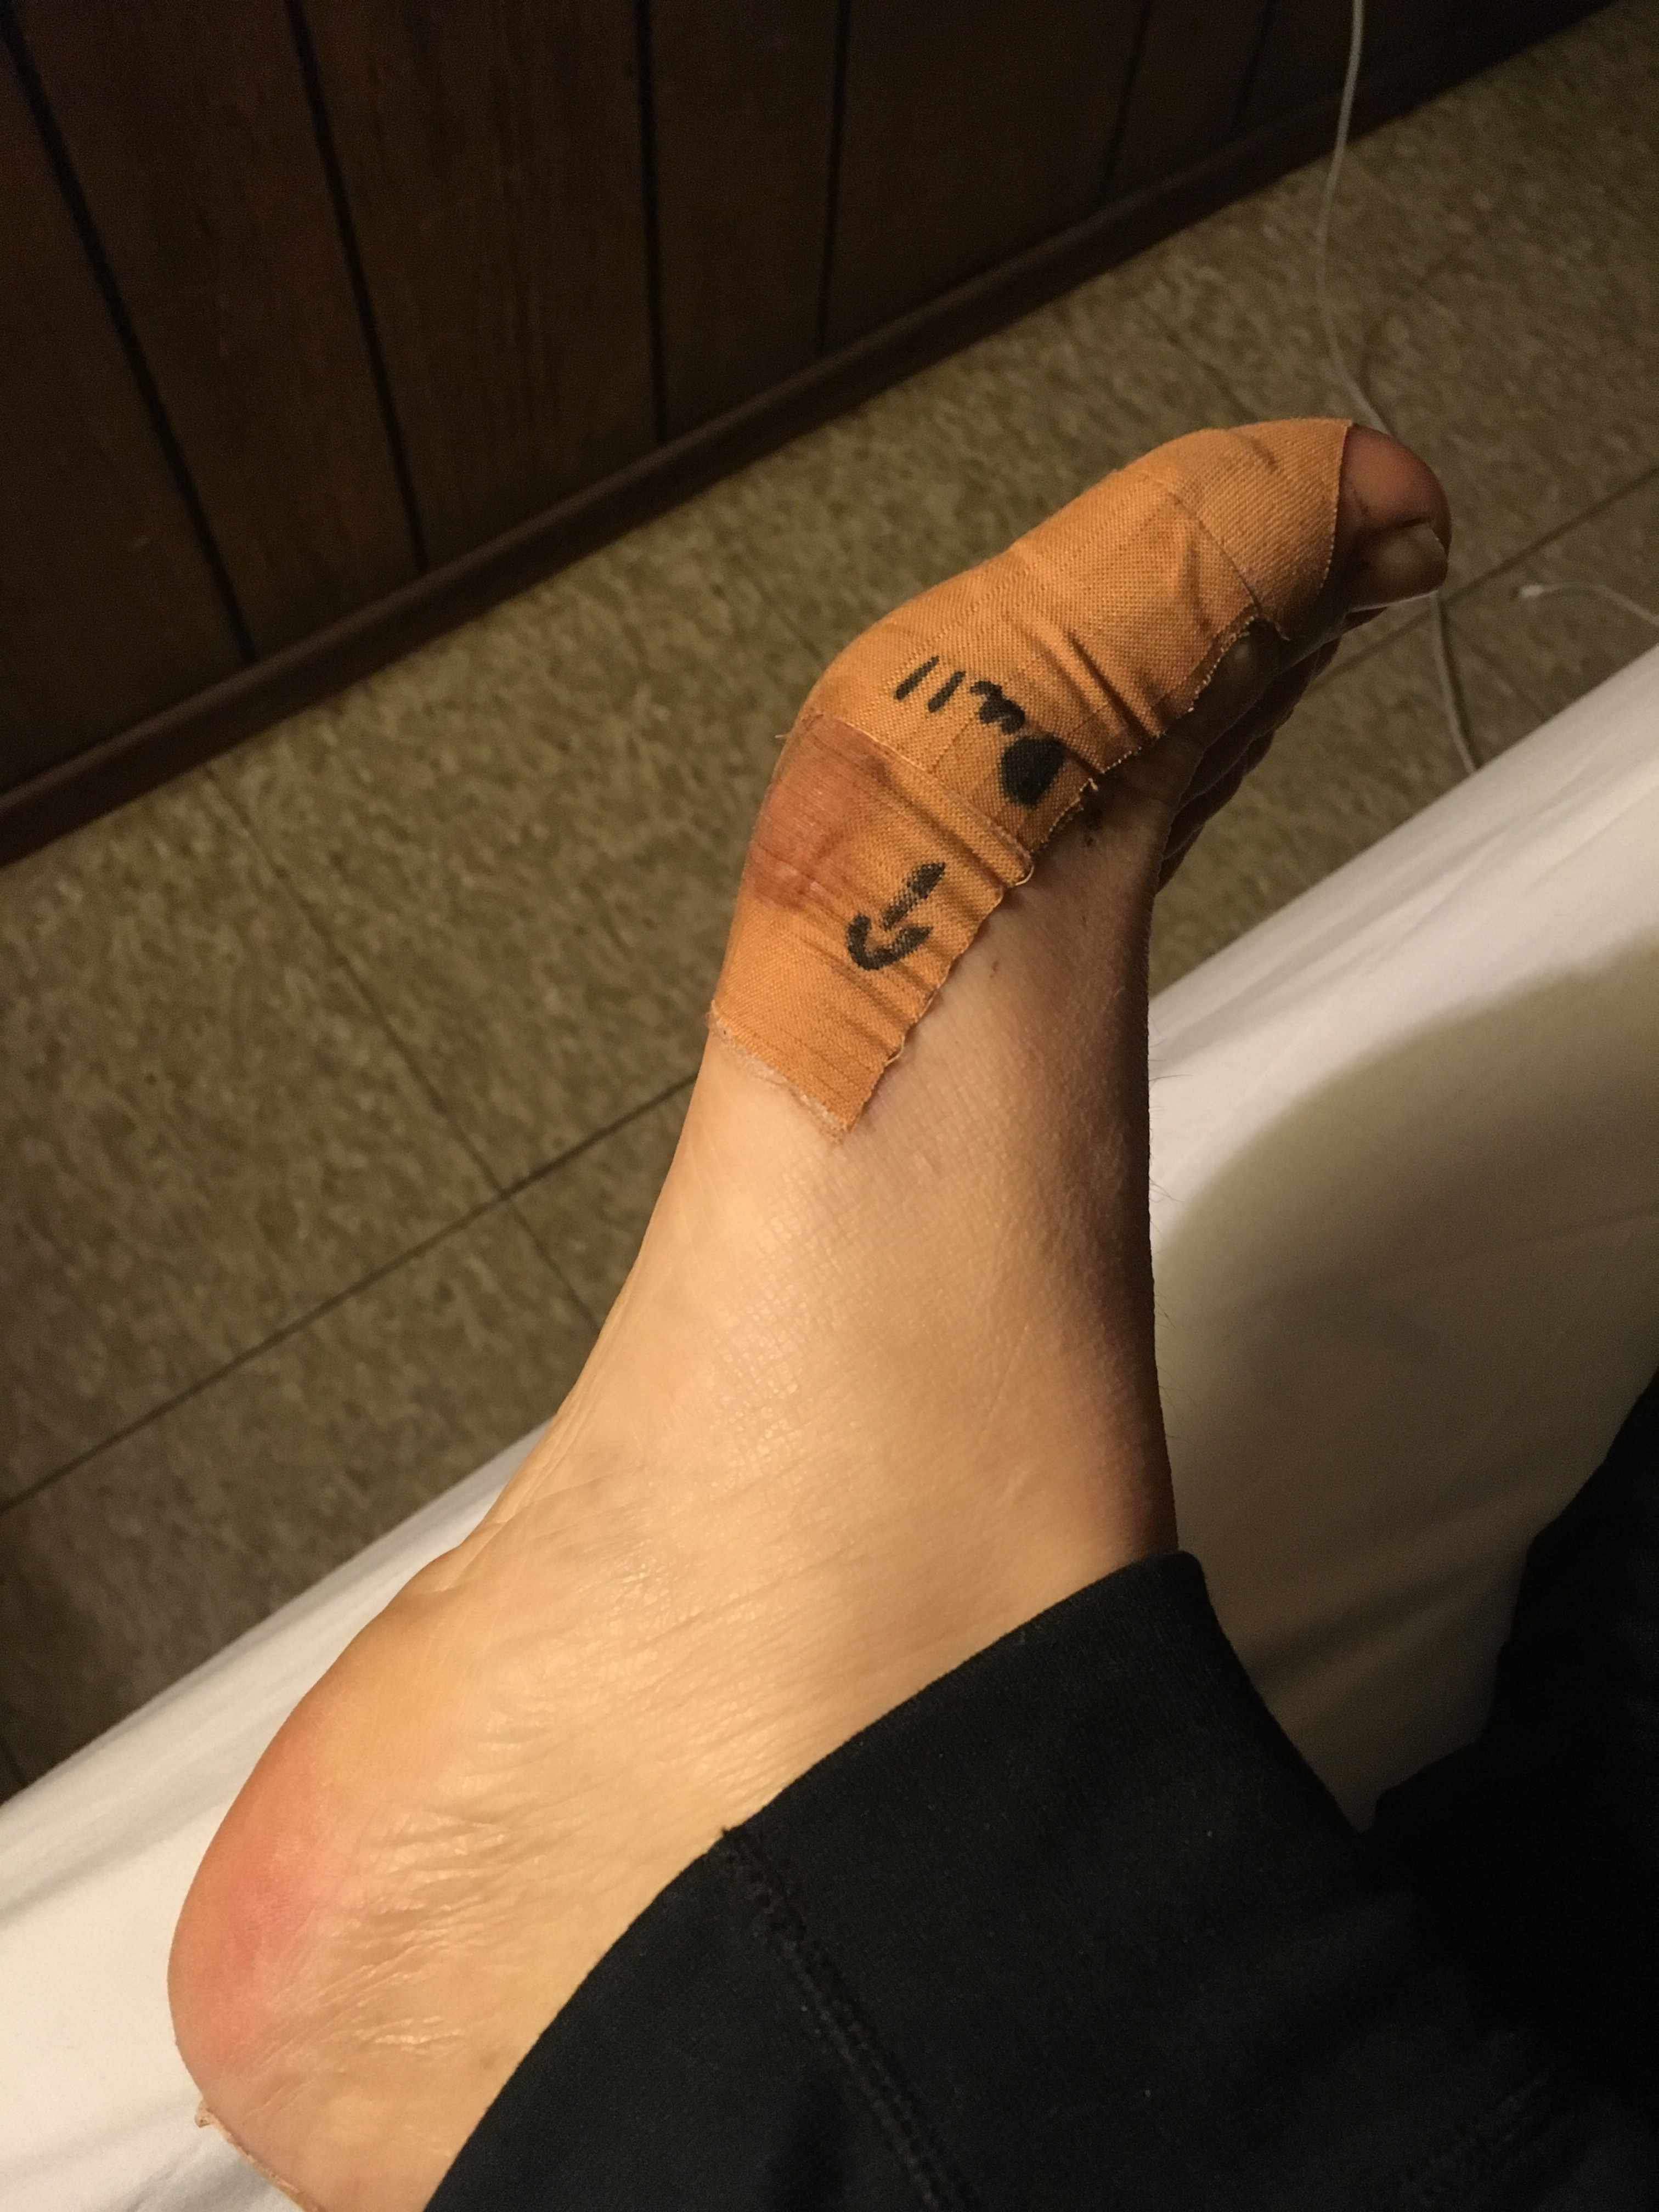 Hot legs feet pics